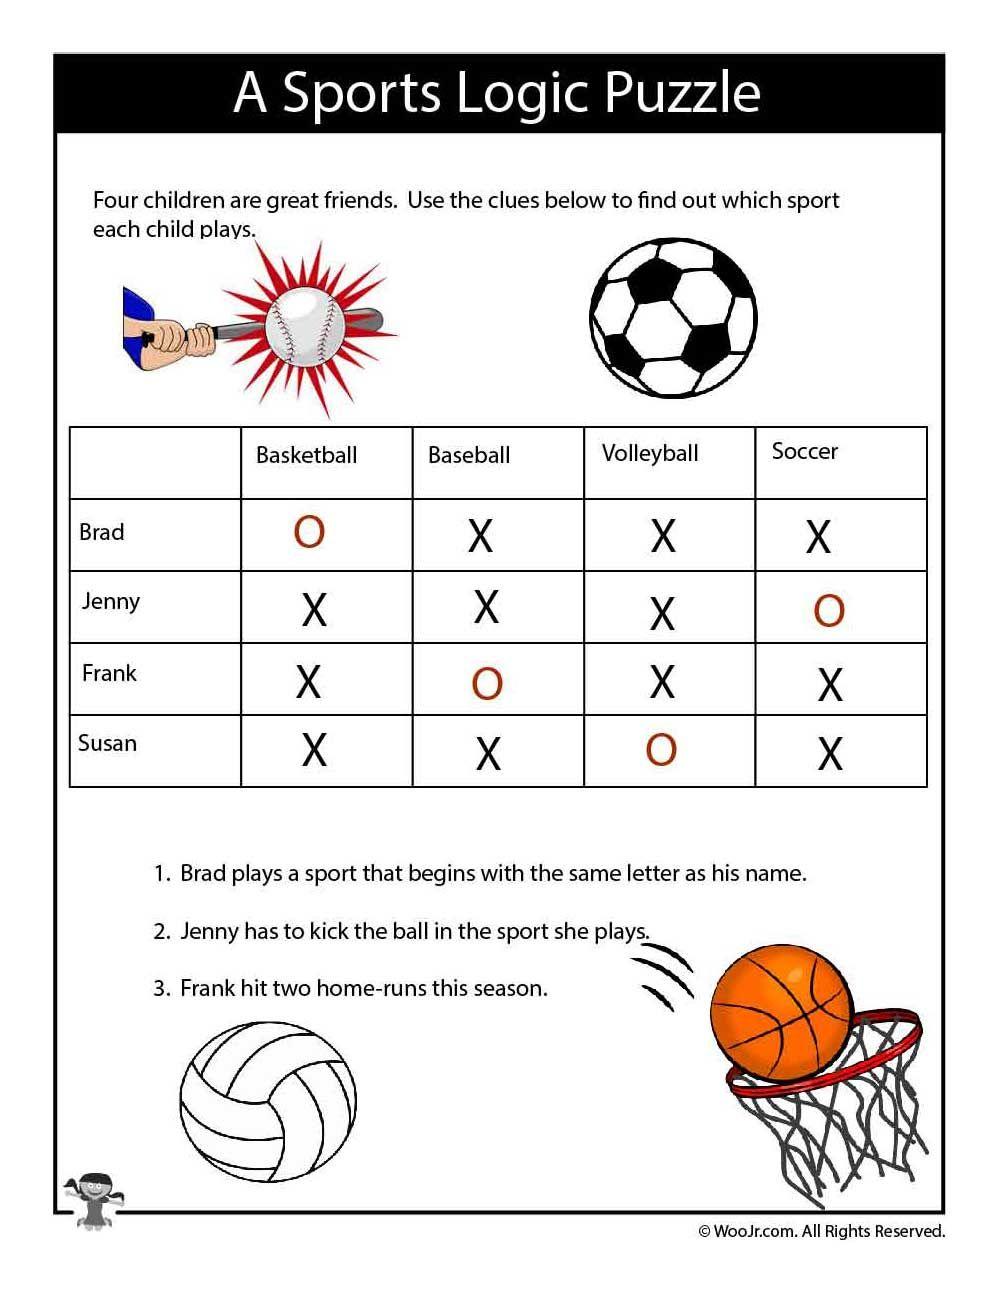 Easy Sports Logic Puzzle ANSWERS Logic puzzles